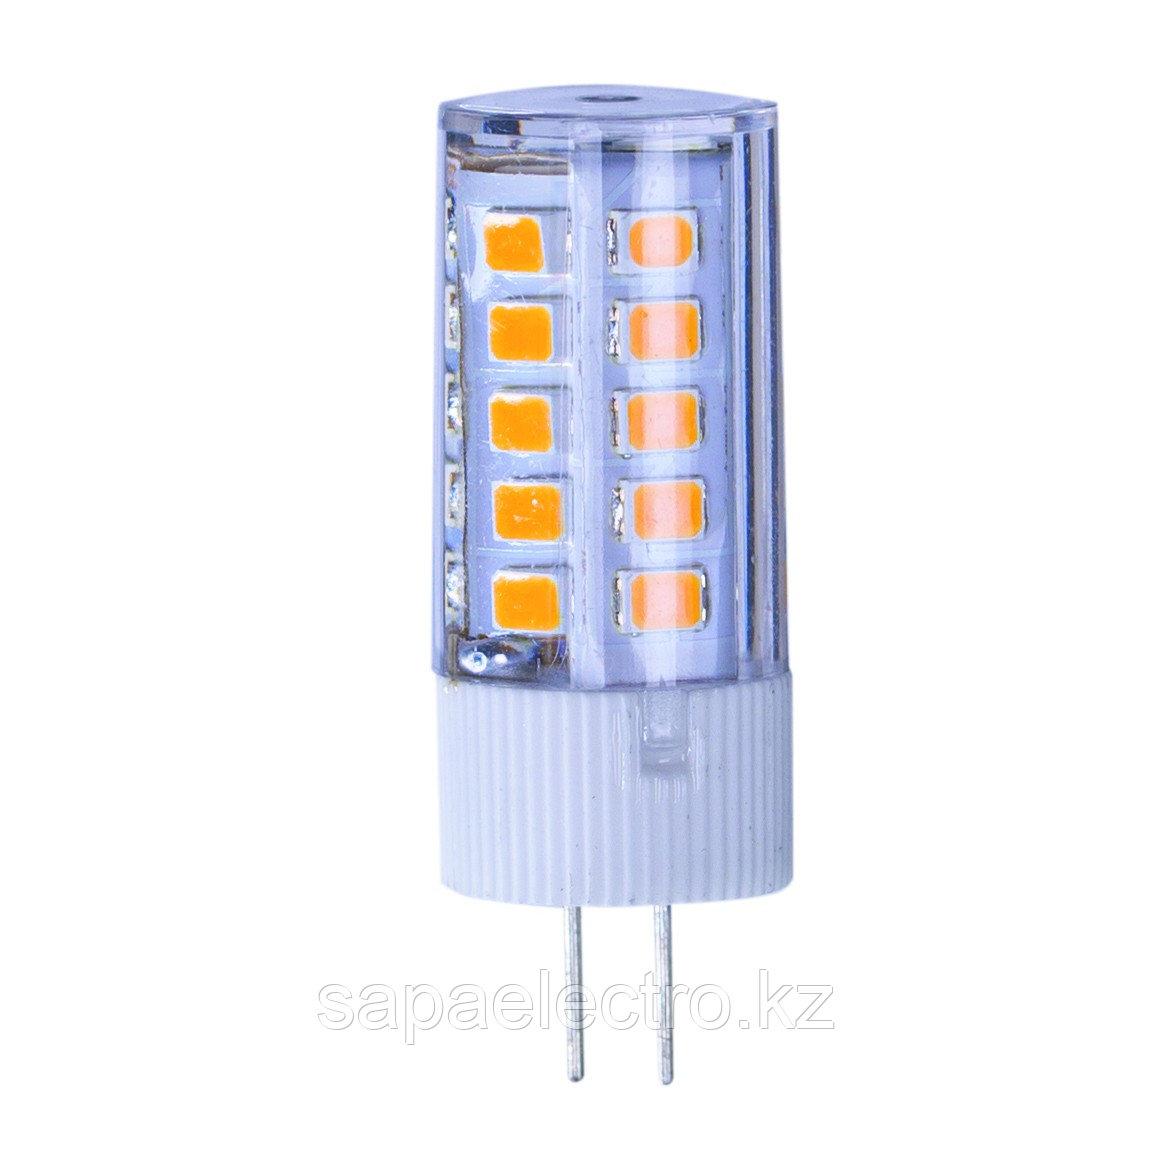 Lampa KAPSUL LED G4 3,5W 350LM 4000K (TL)500